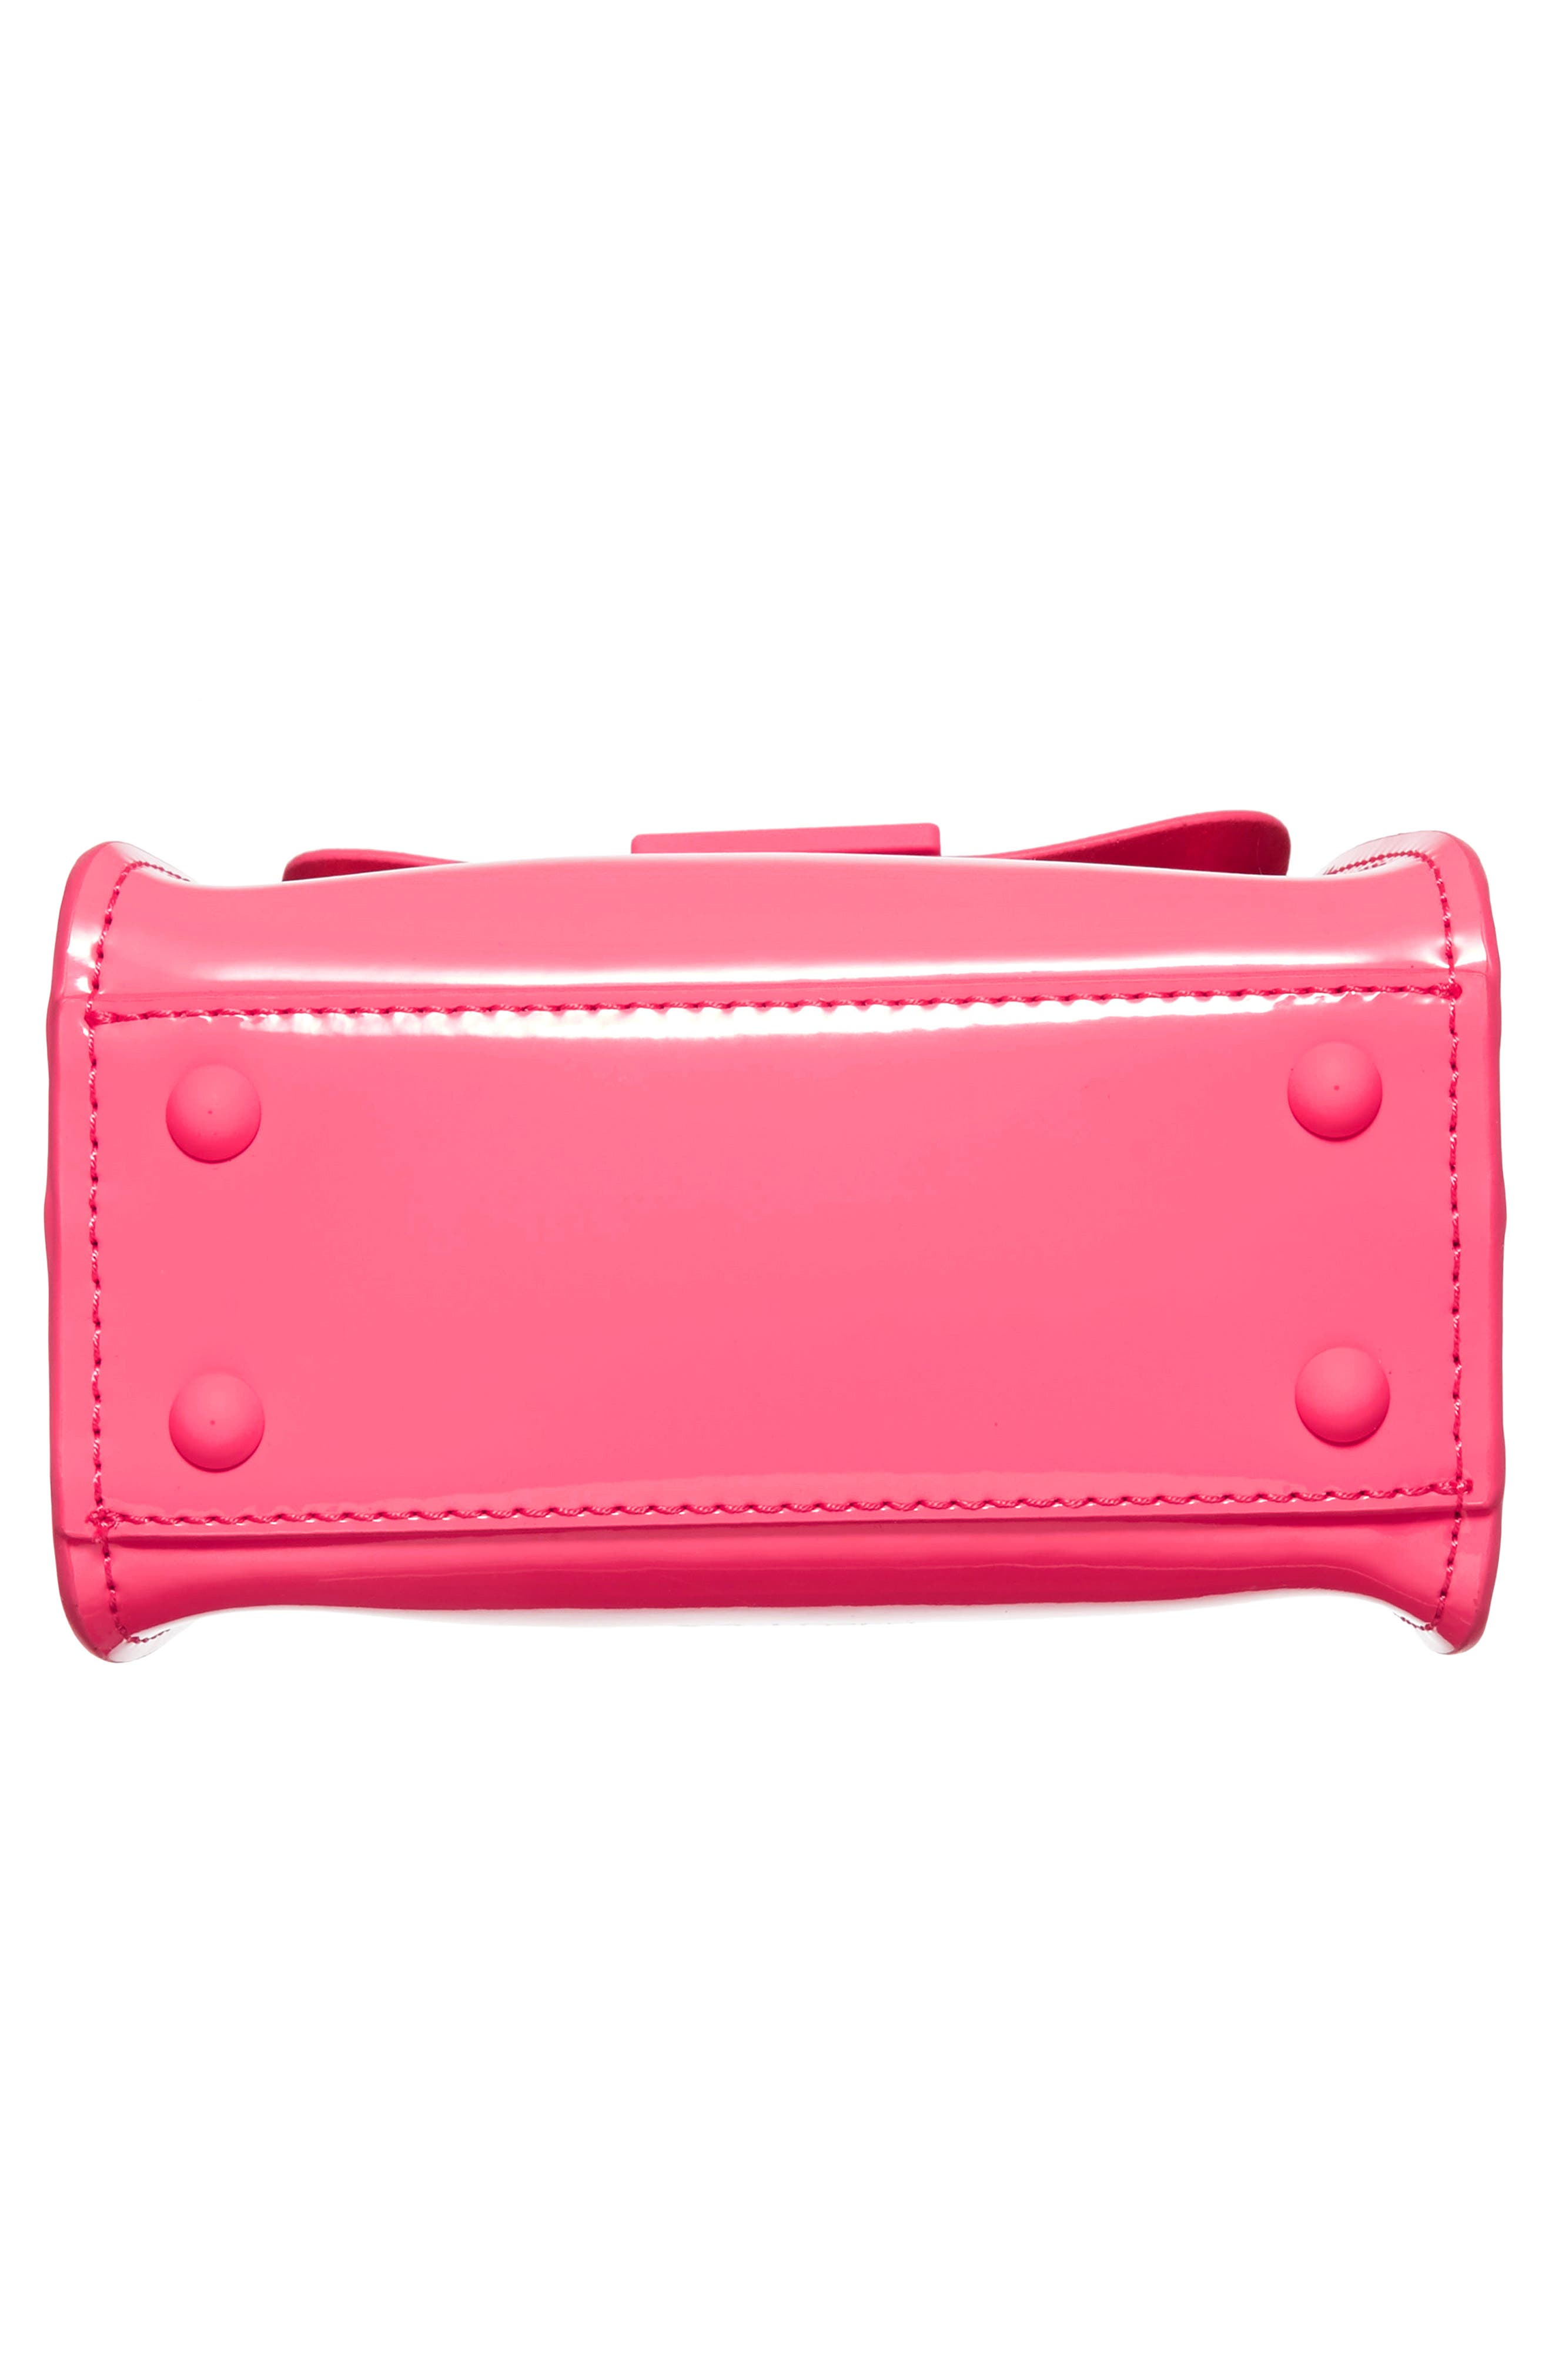 Eartha Iconic Patent Leather Mini Bag,                             Alternate thumbnail 6, color,                             650